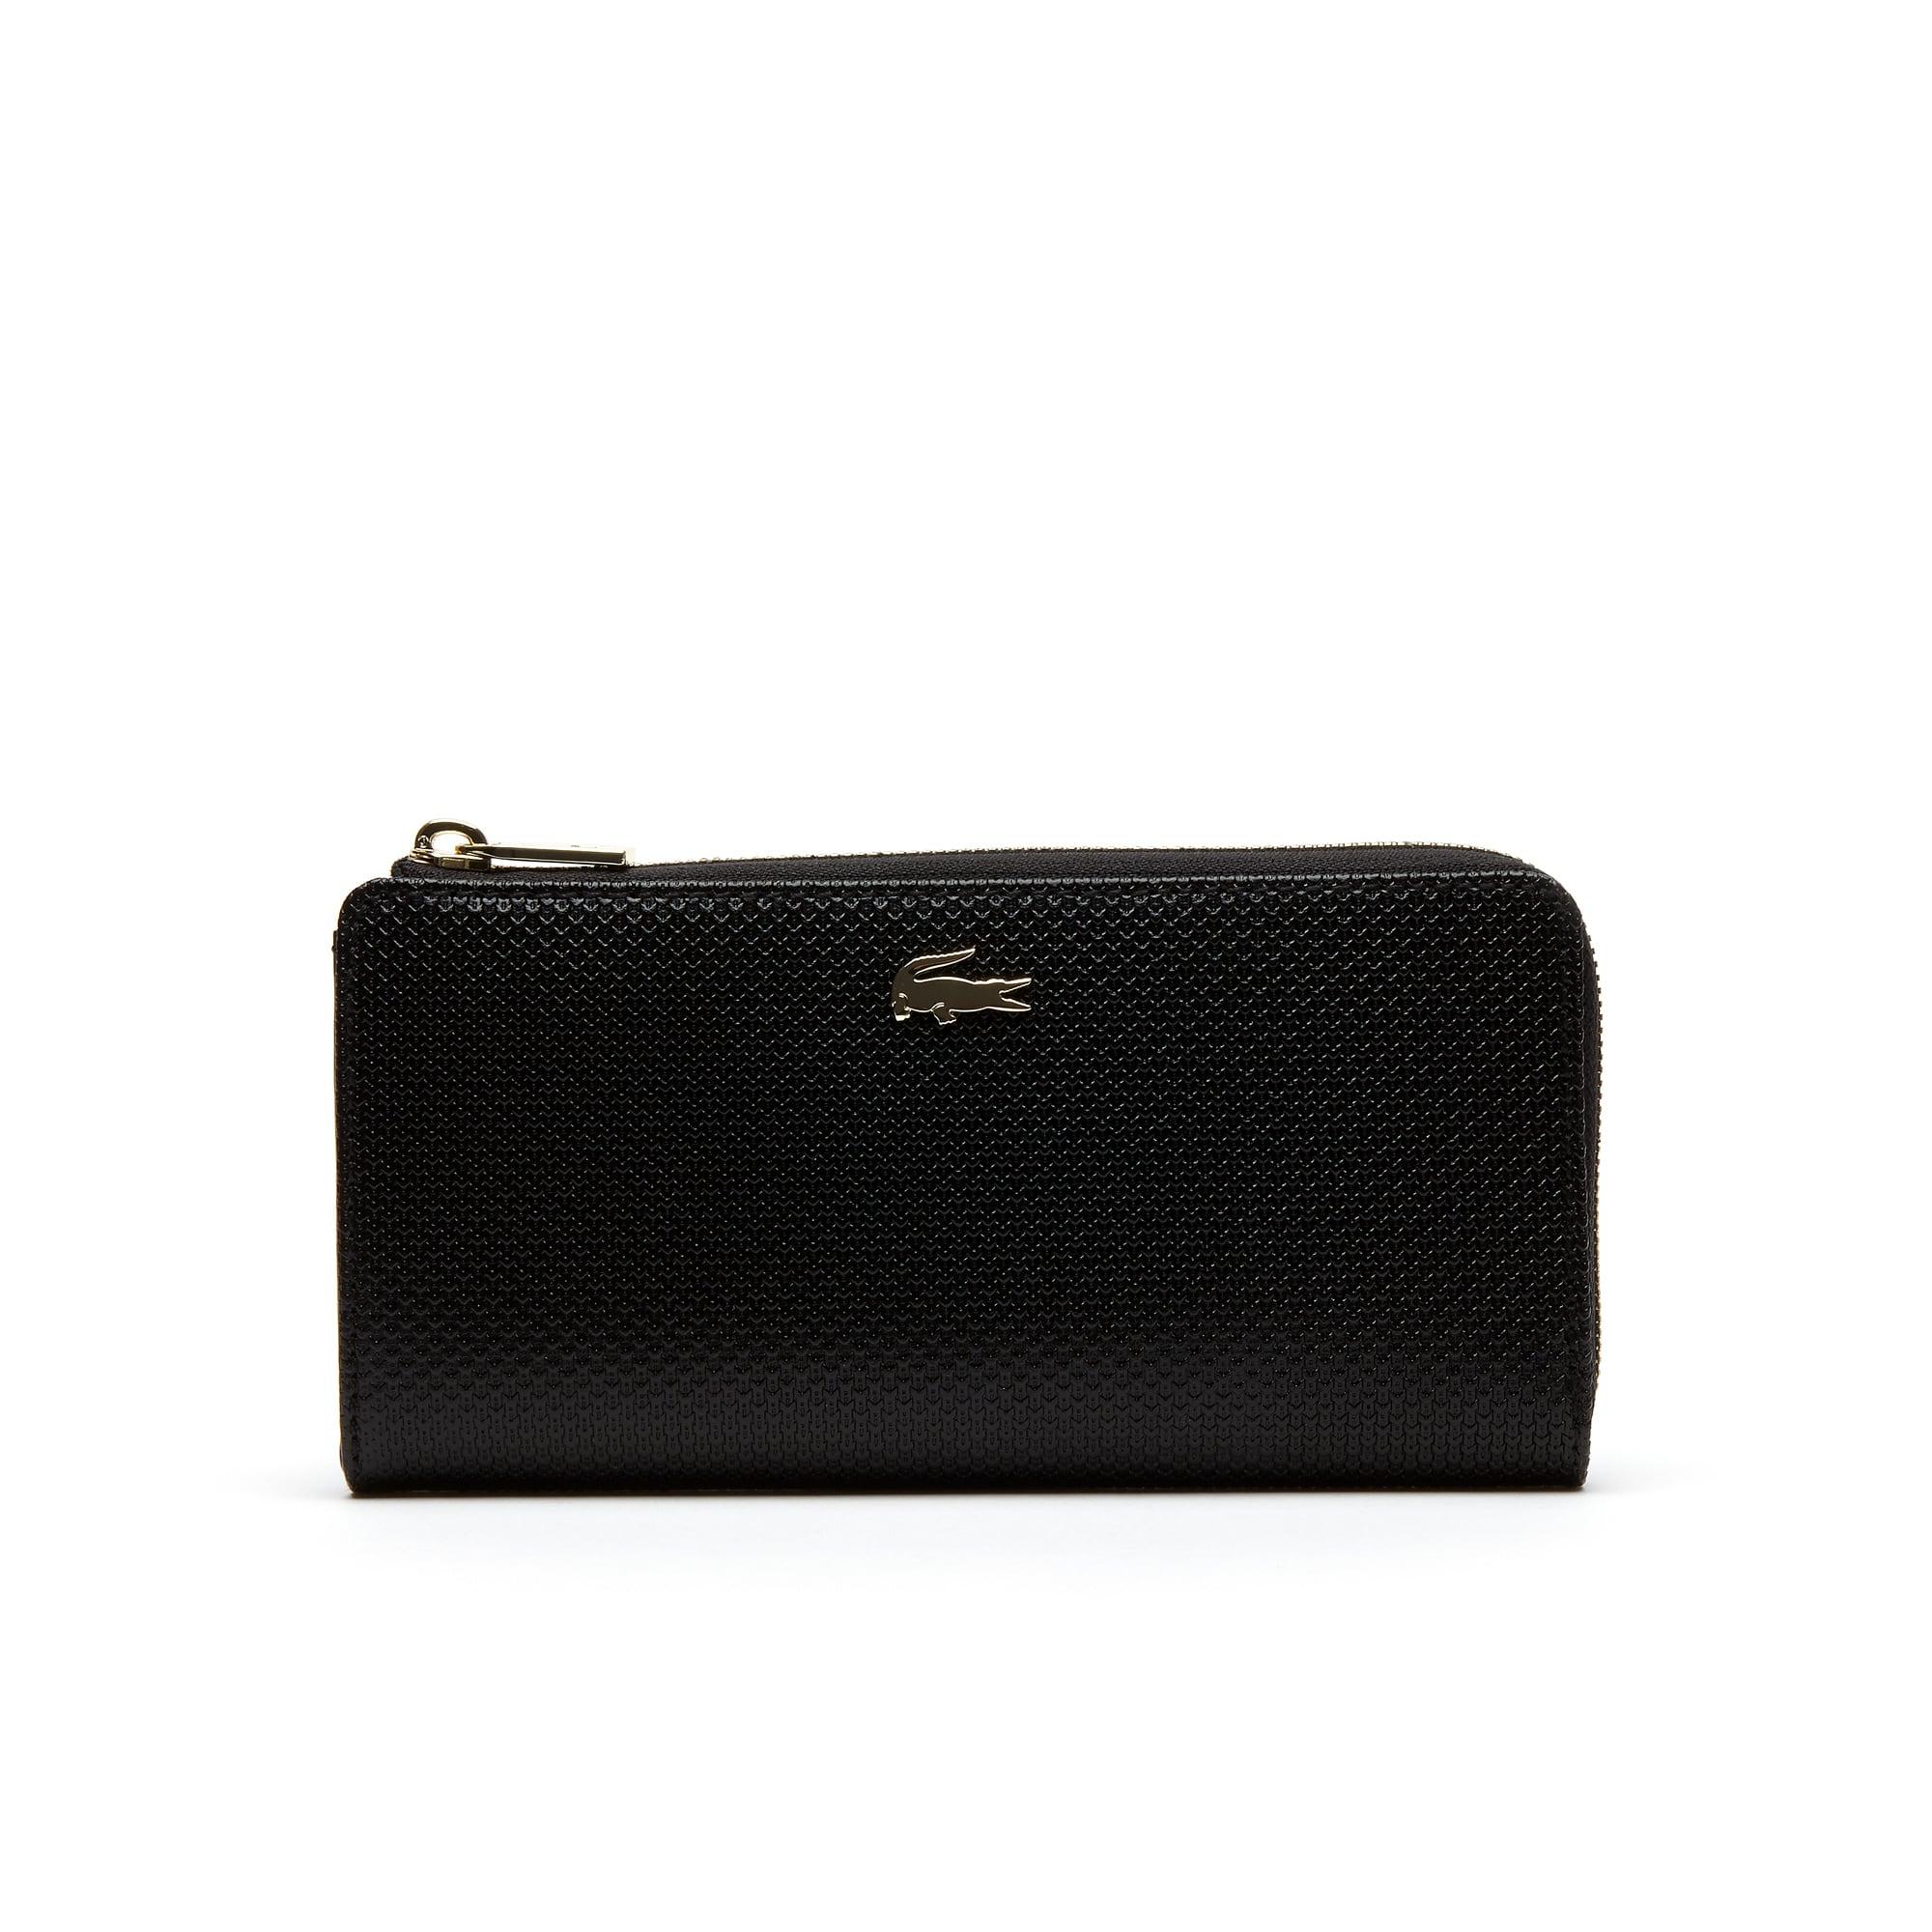 Women's Chantaco Piqué Leather 8 Card Zip Wallet